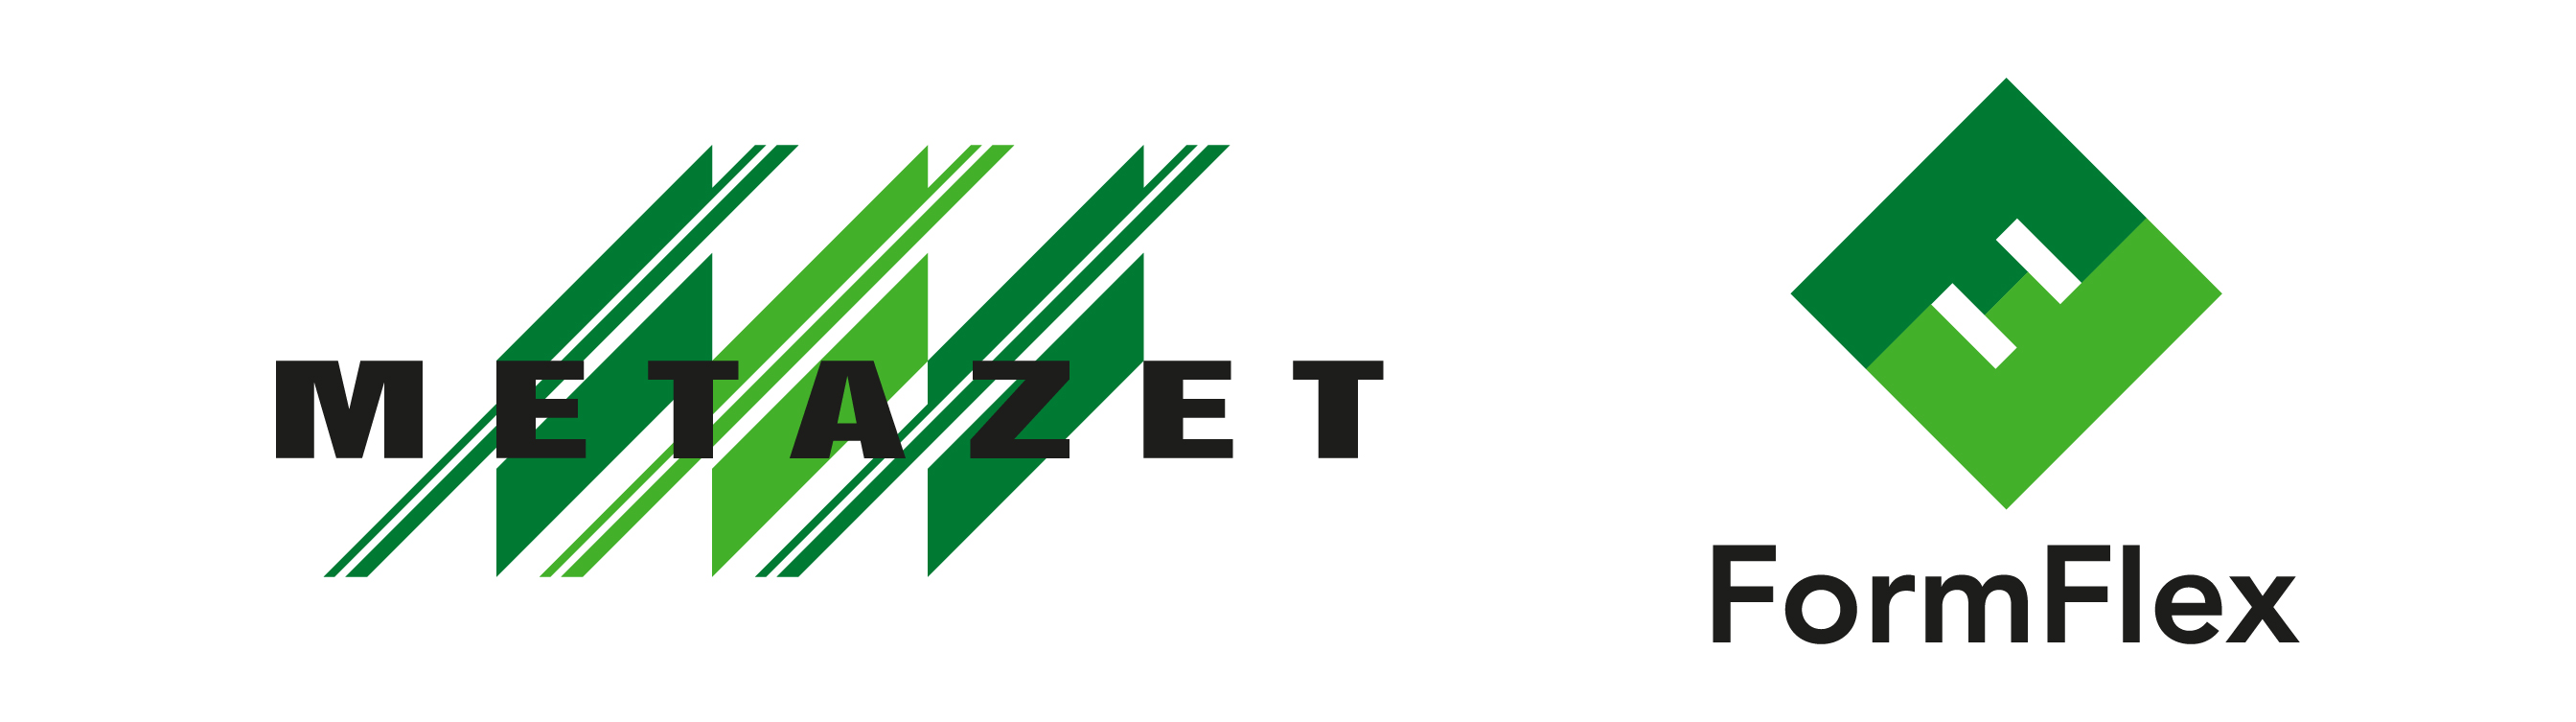 Exhibitor: Metazet/FormFlex | IPM ESSEN